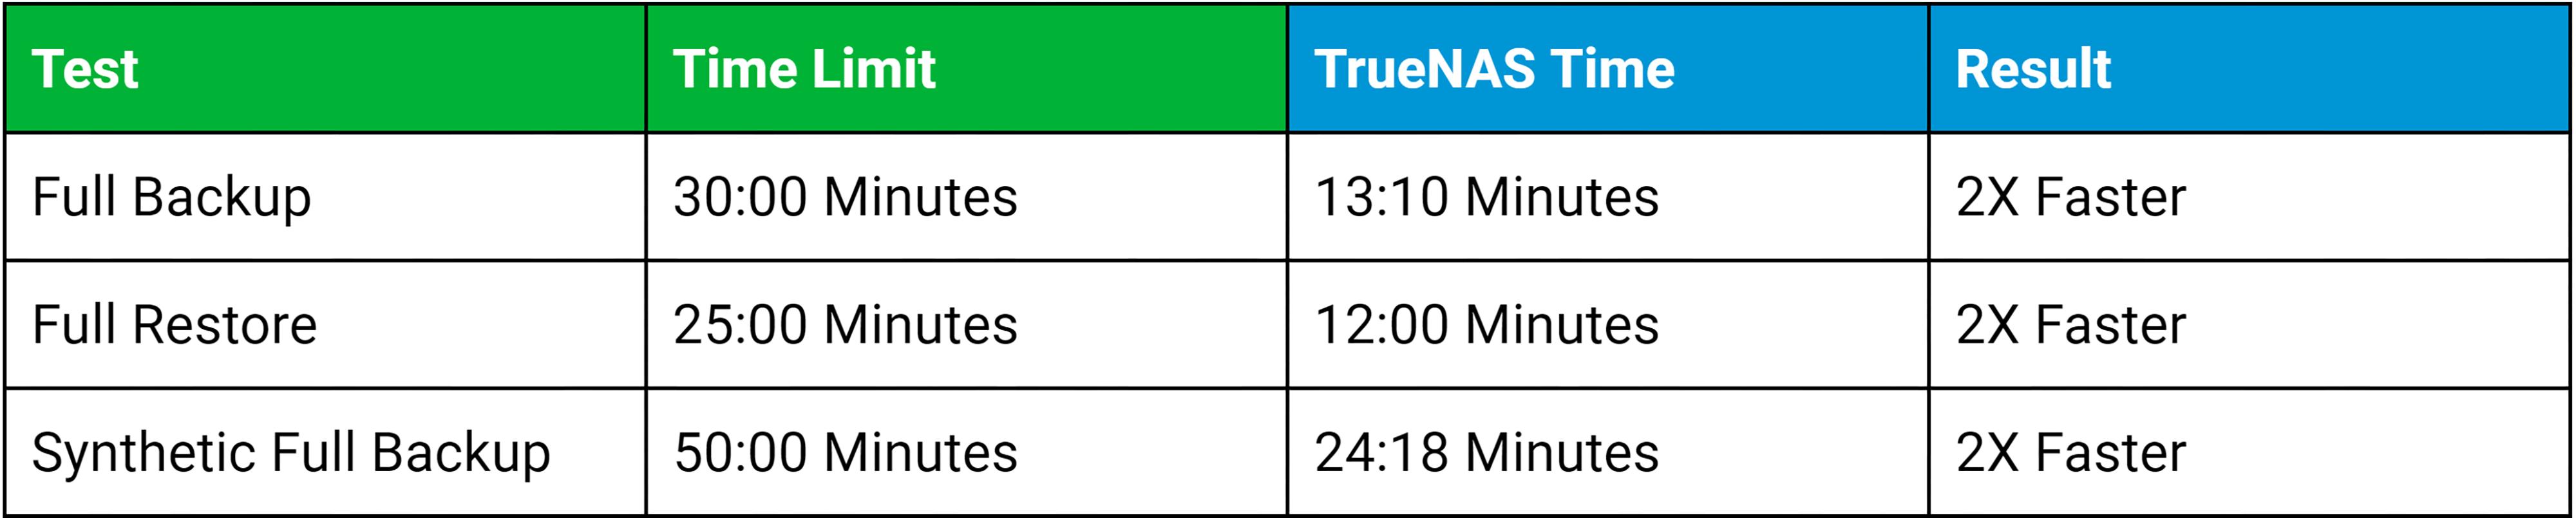 TrueNAS X-Series Certified for Veeam Backup - iXsystems, Inc